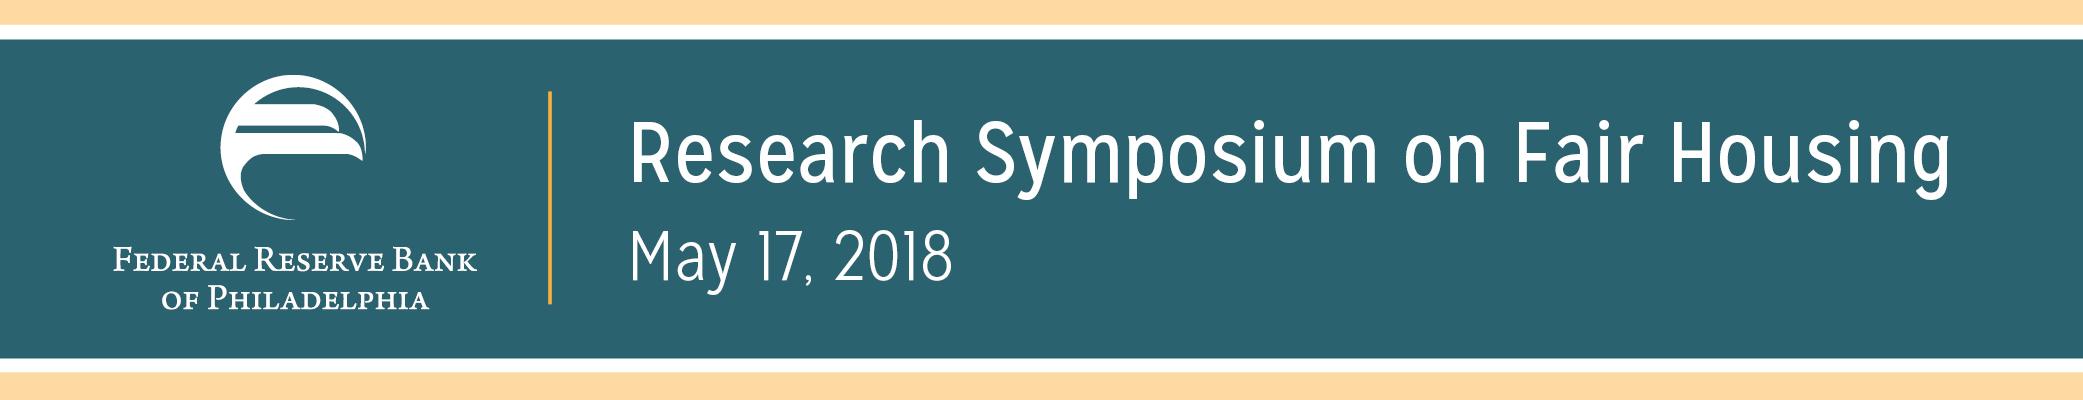 Research Symposium on Fair Housing